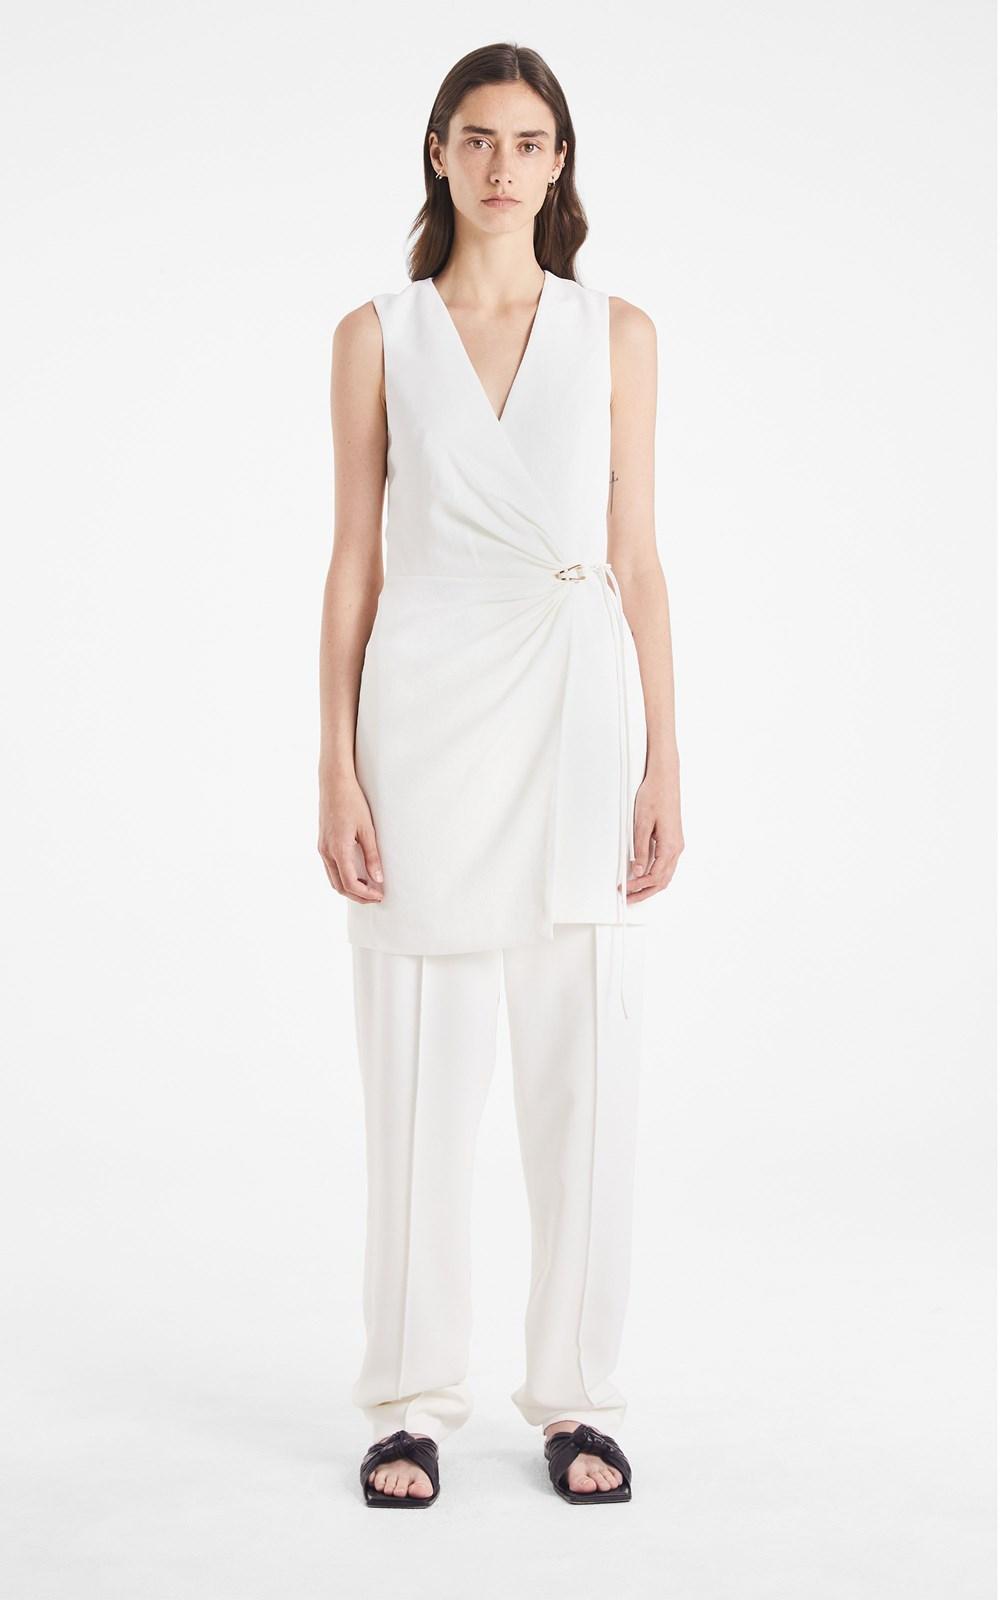 New  | WHITEWASH LINK MINI DRESS